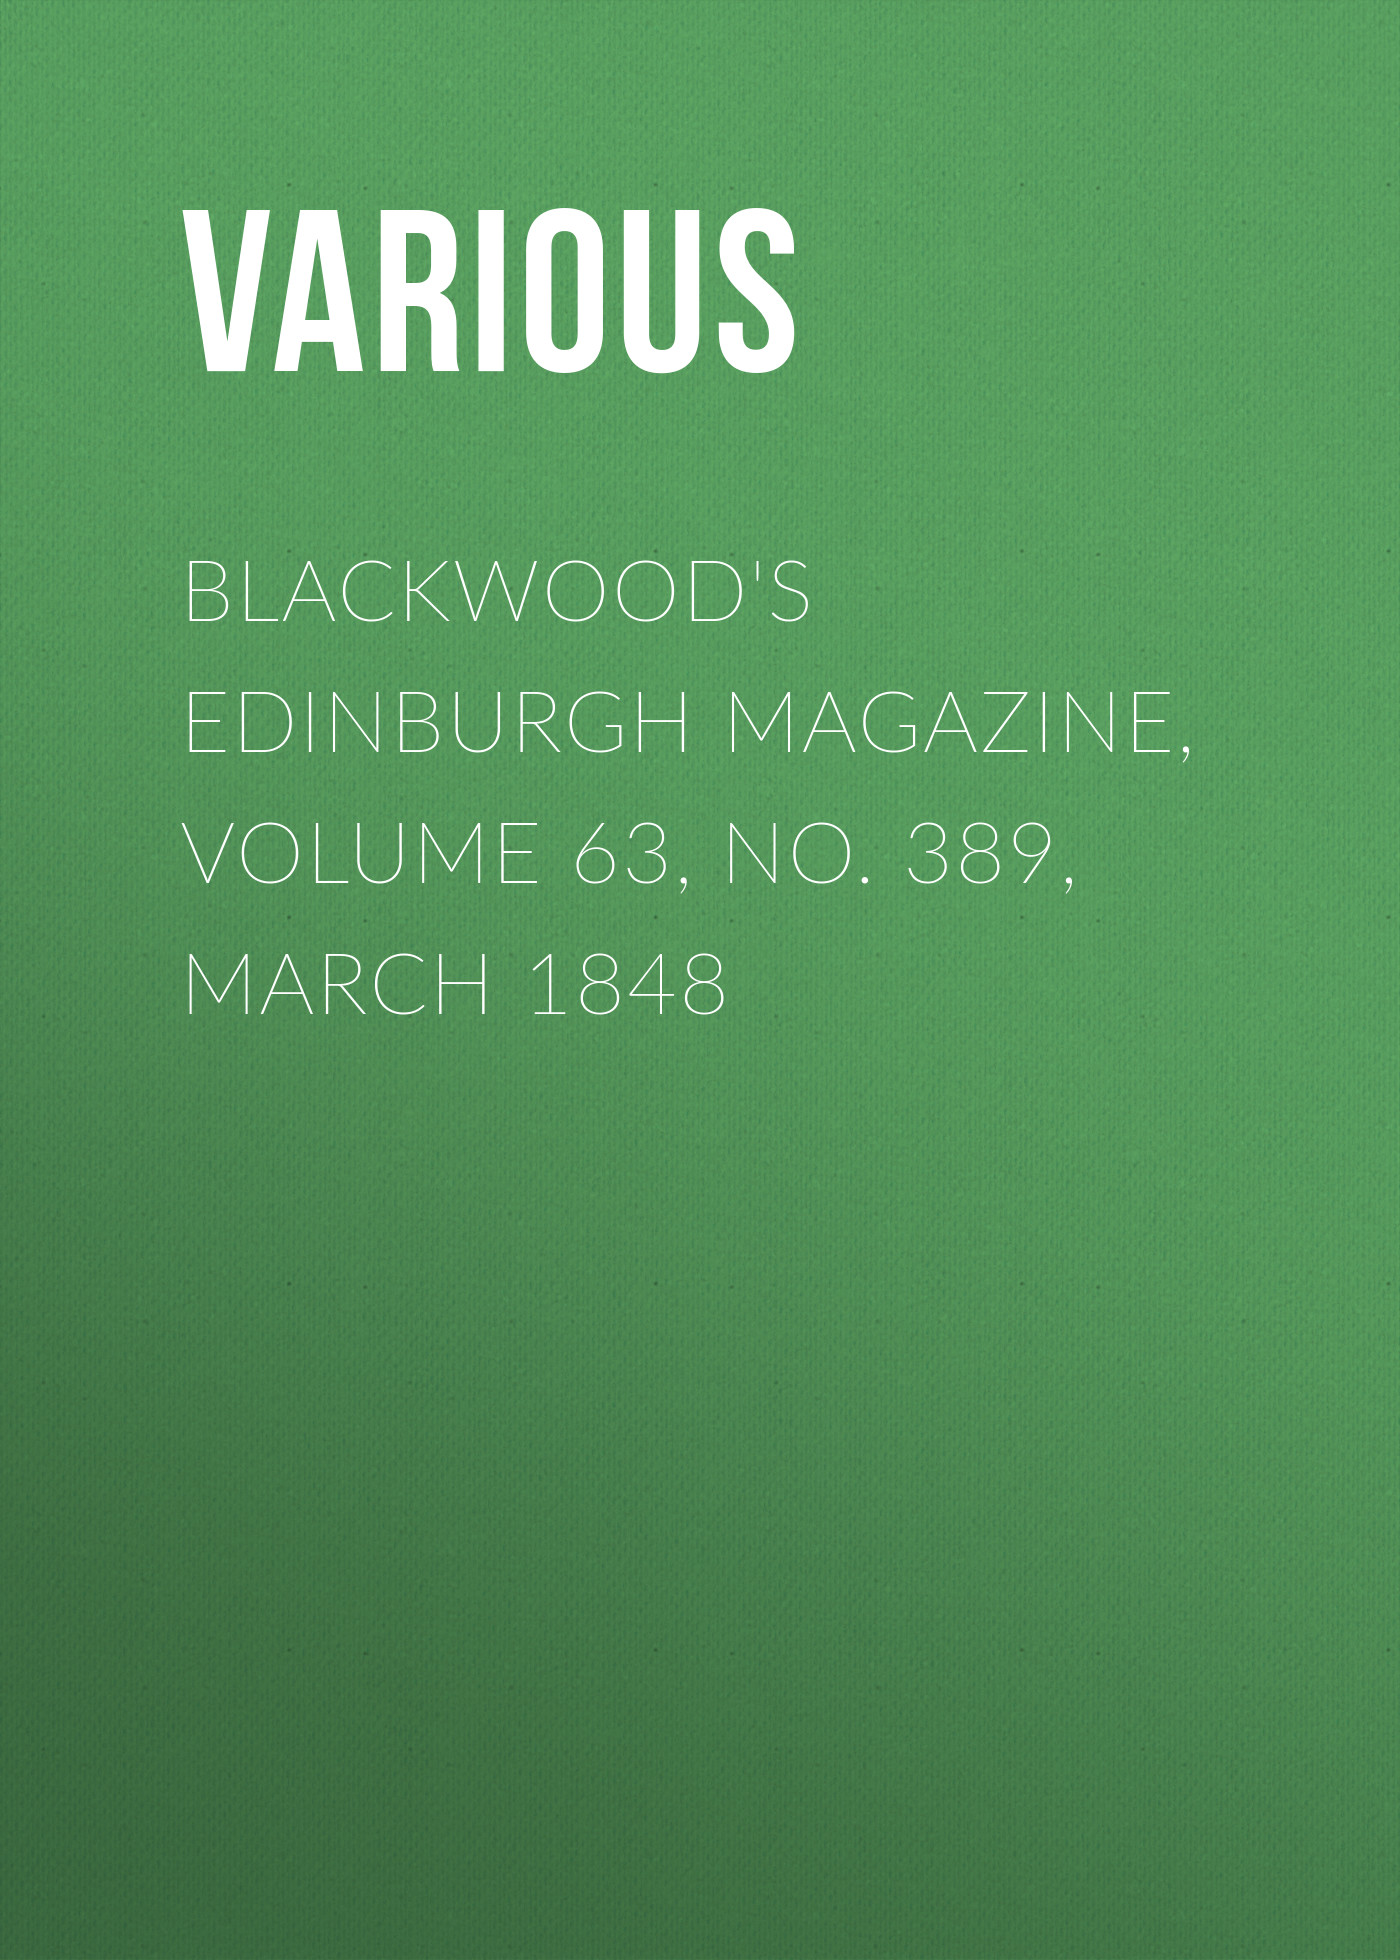 Various Blackwood's Edinburgh Magazine, Volume 63, No. 389, March 1848 various blackwoods edinburgh magazine – volume 55 no 341 march 1844